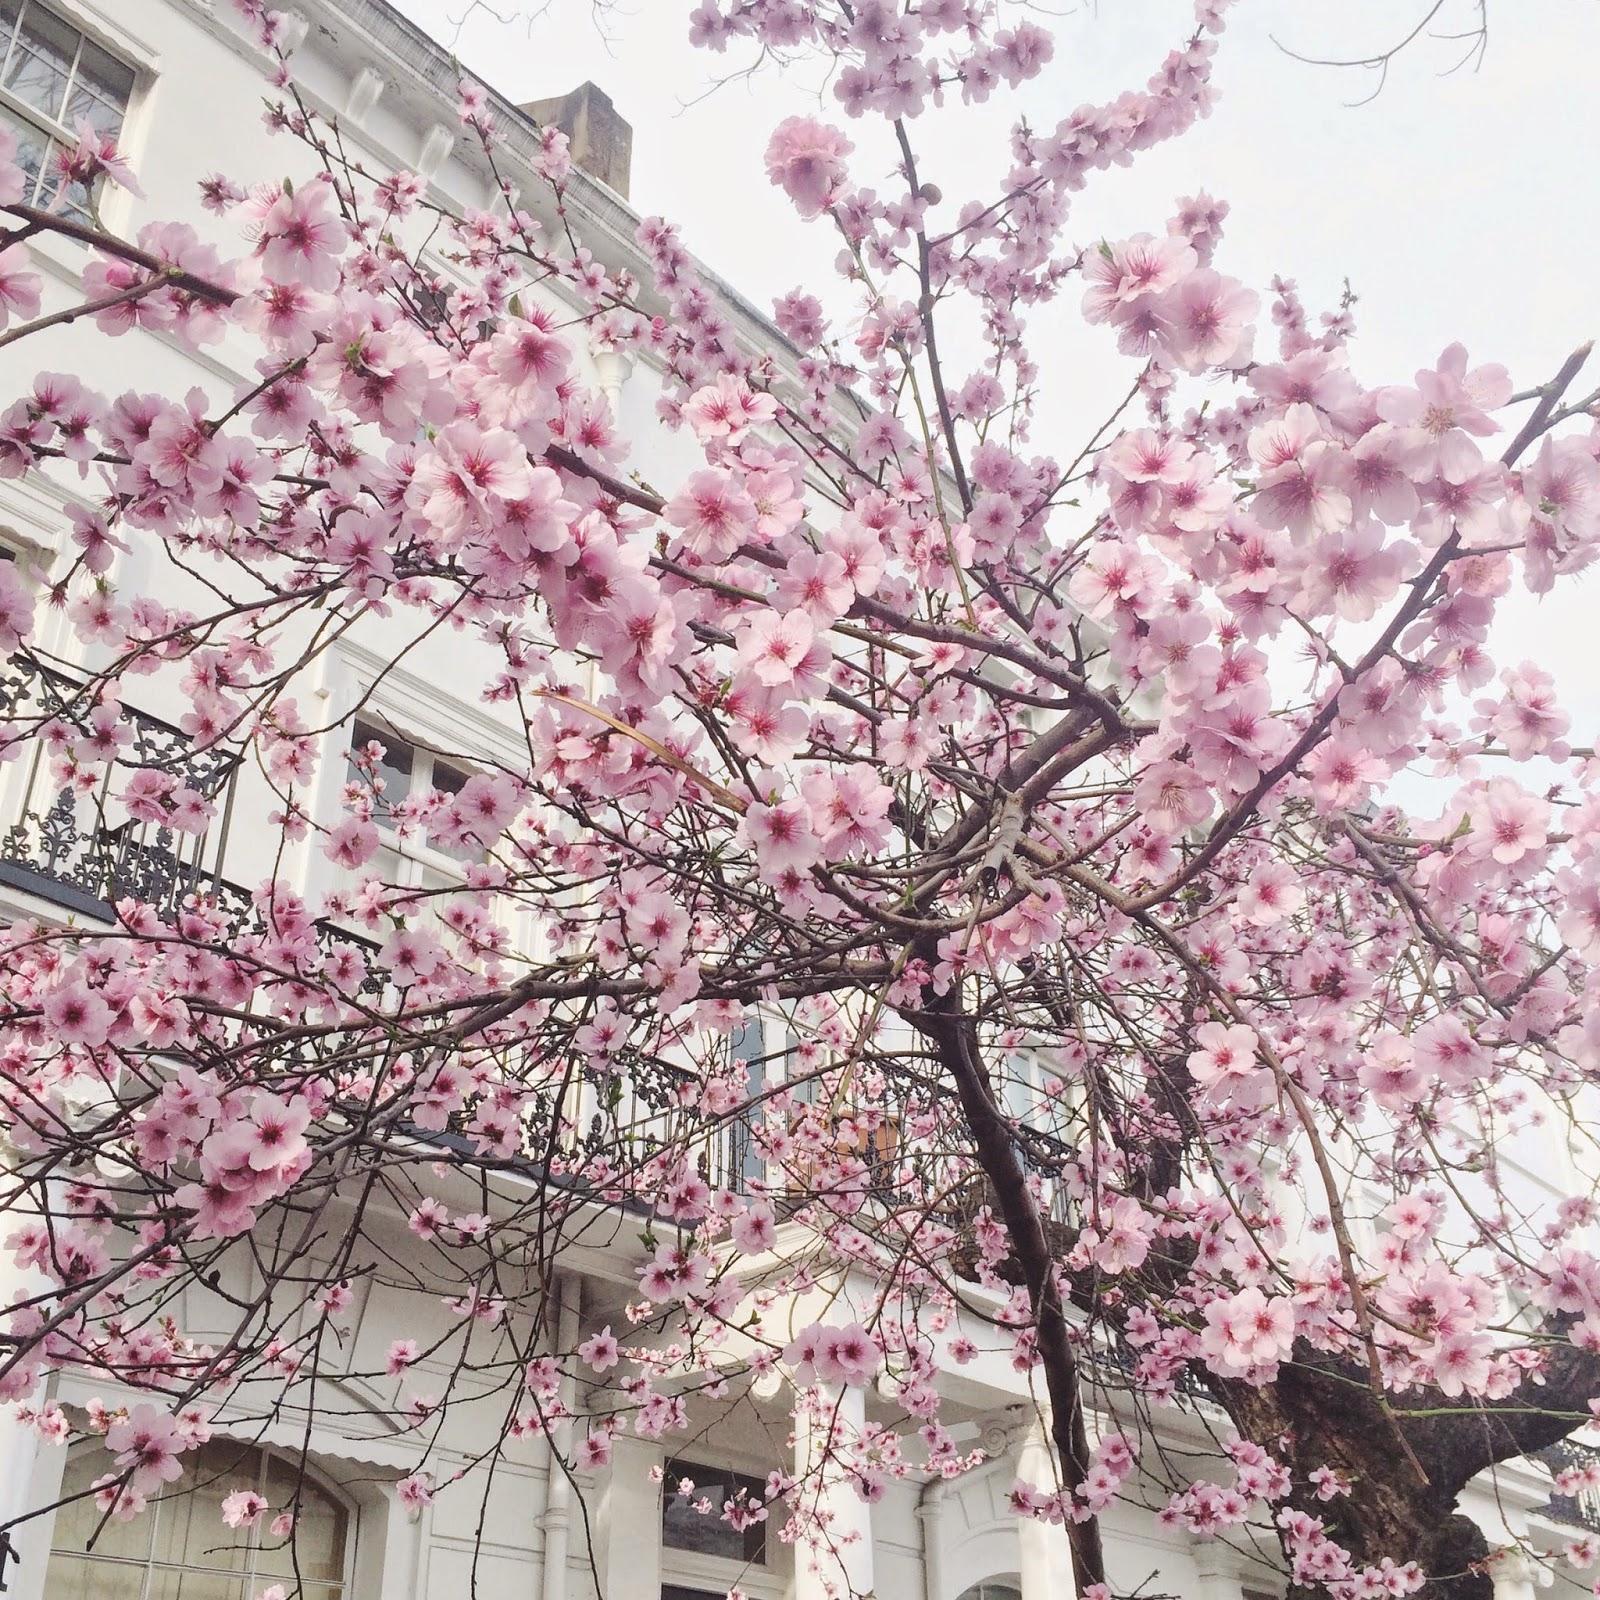 cherrytree, cherryblossom, spring, london, pink cherry tree